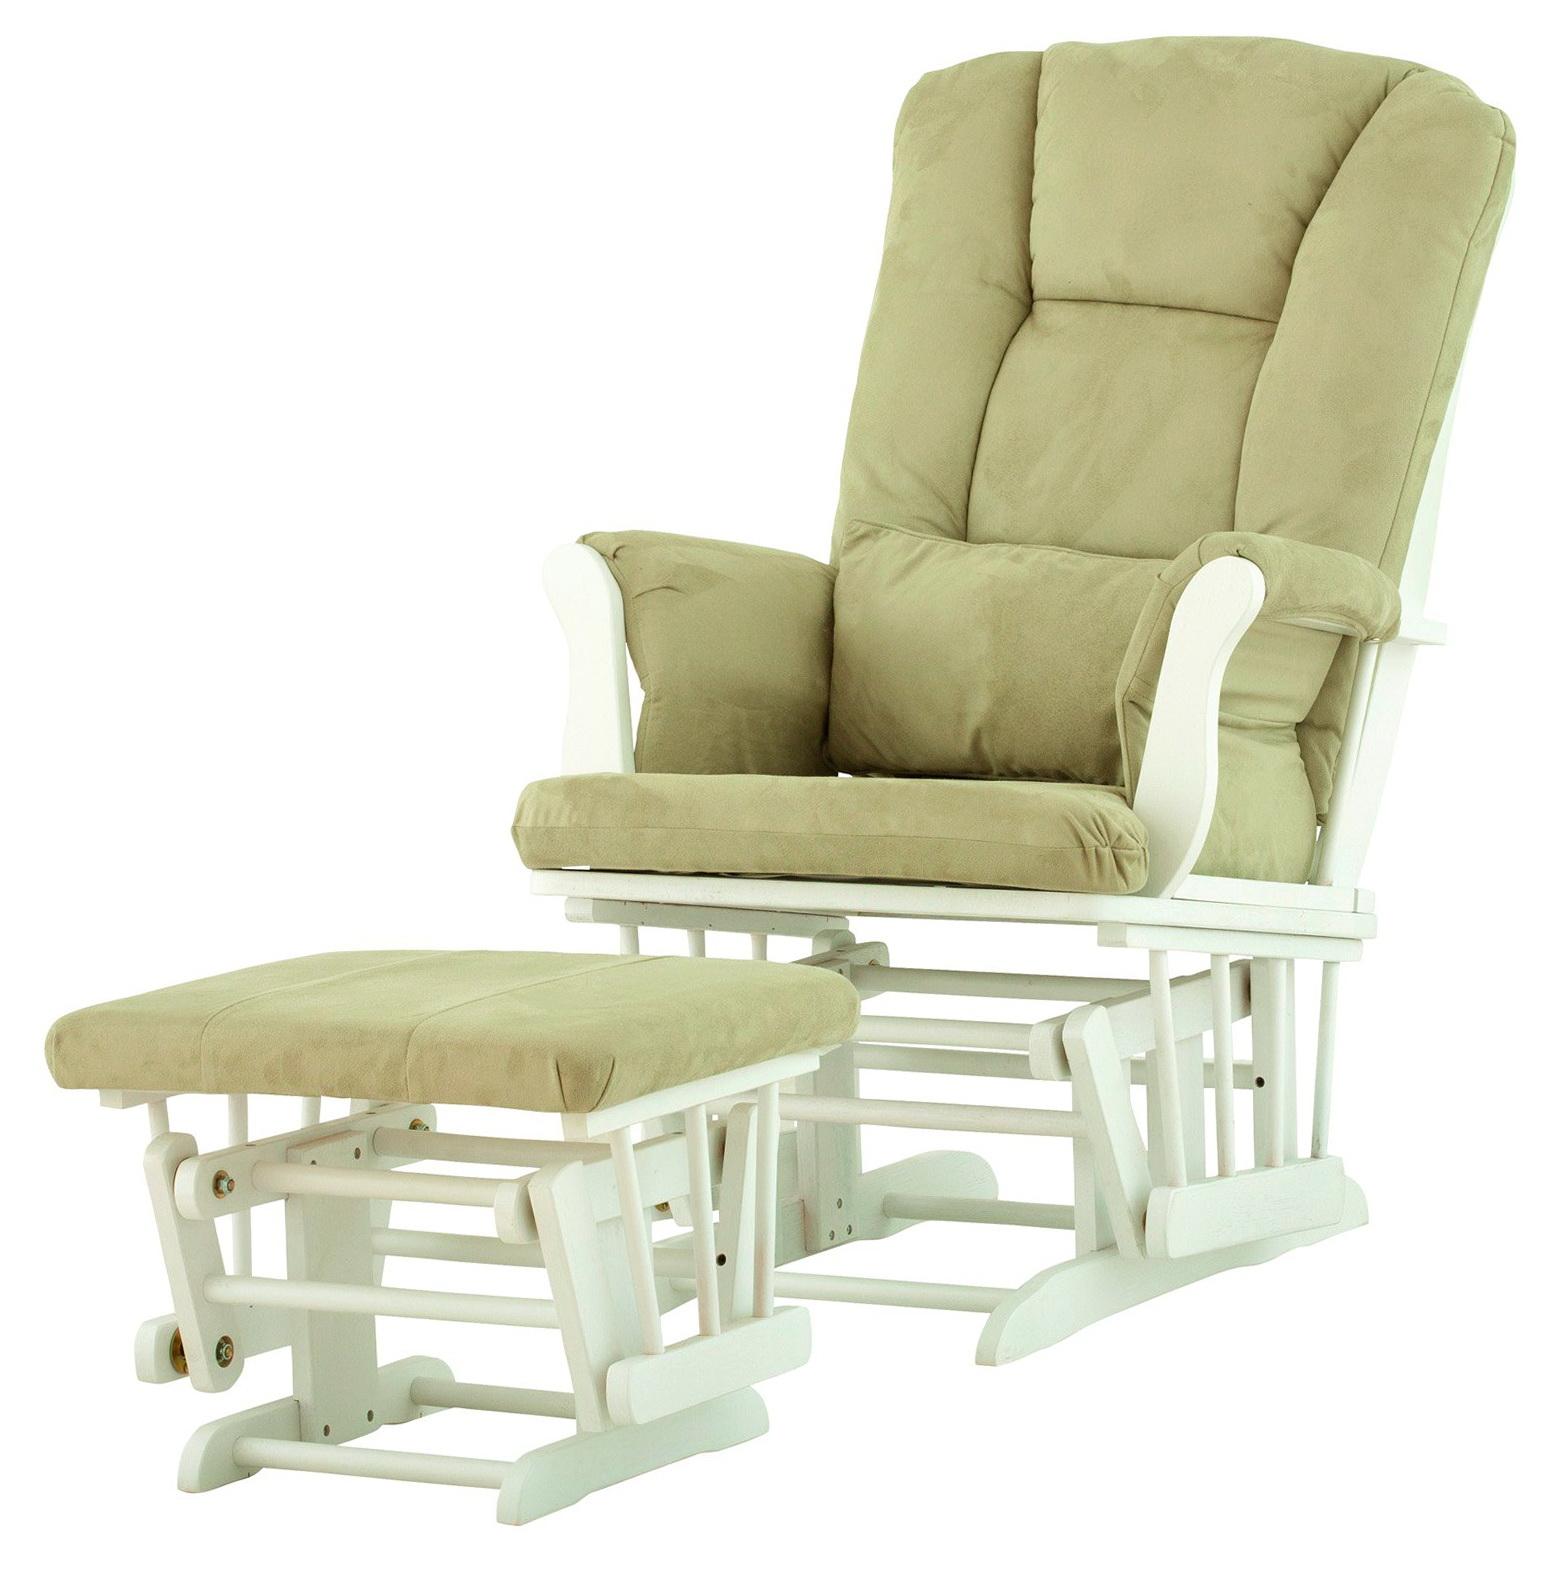 Fullsize Of Glider Rocker Replacement Cushions